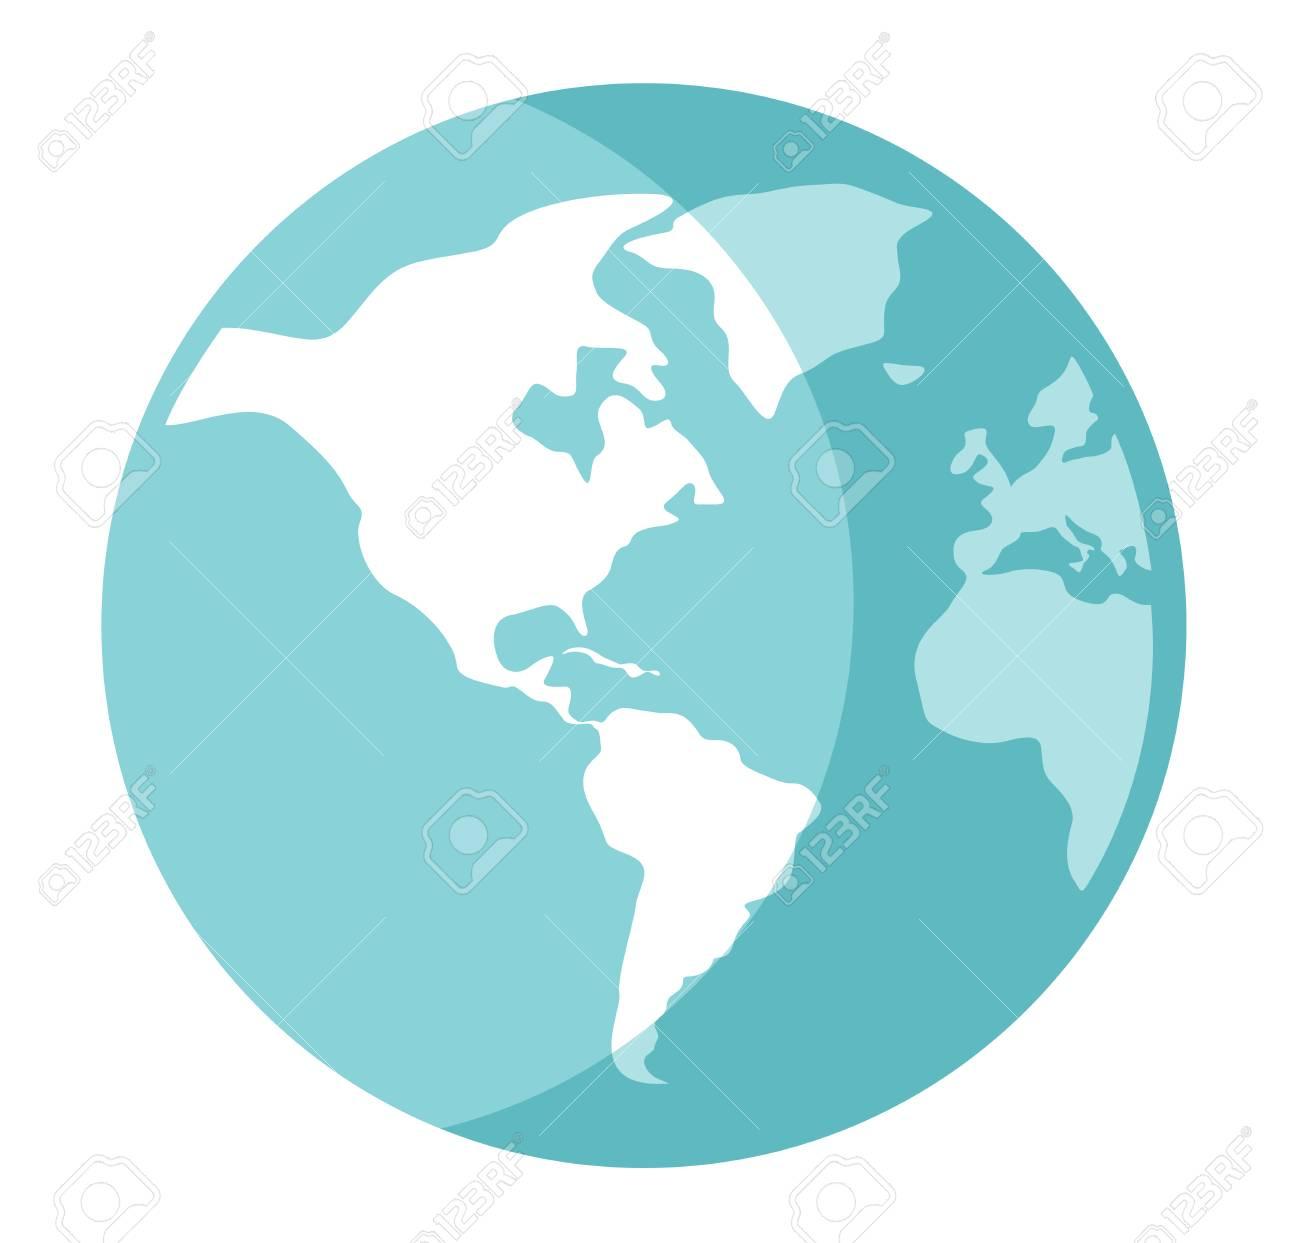 world globe vector cartoon illustration isolated on white background rh 123rf com world globe vector art world globe vector free download